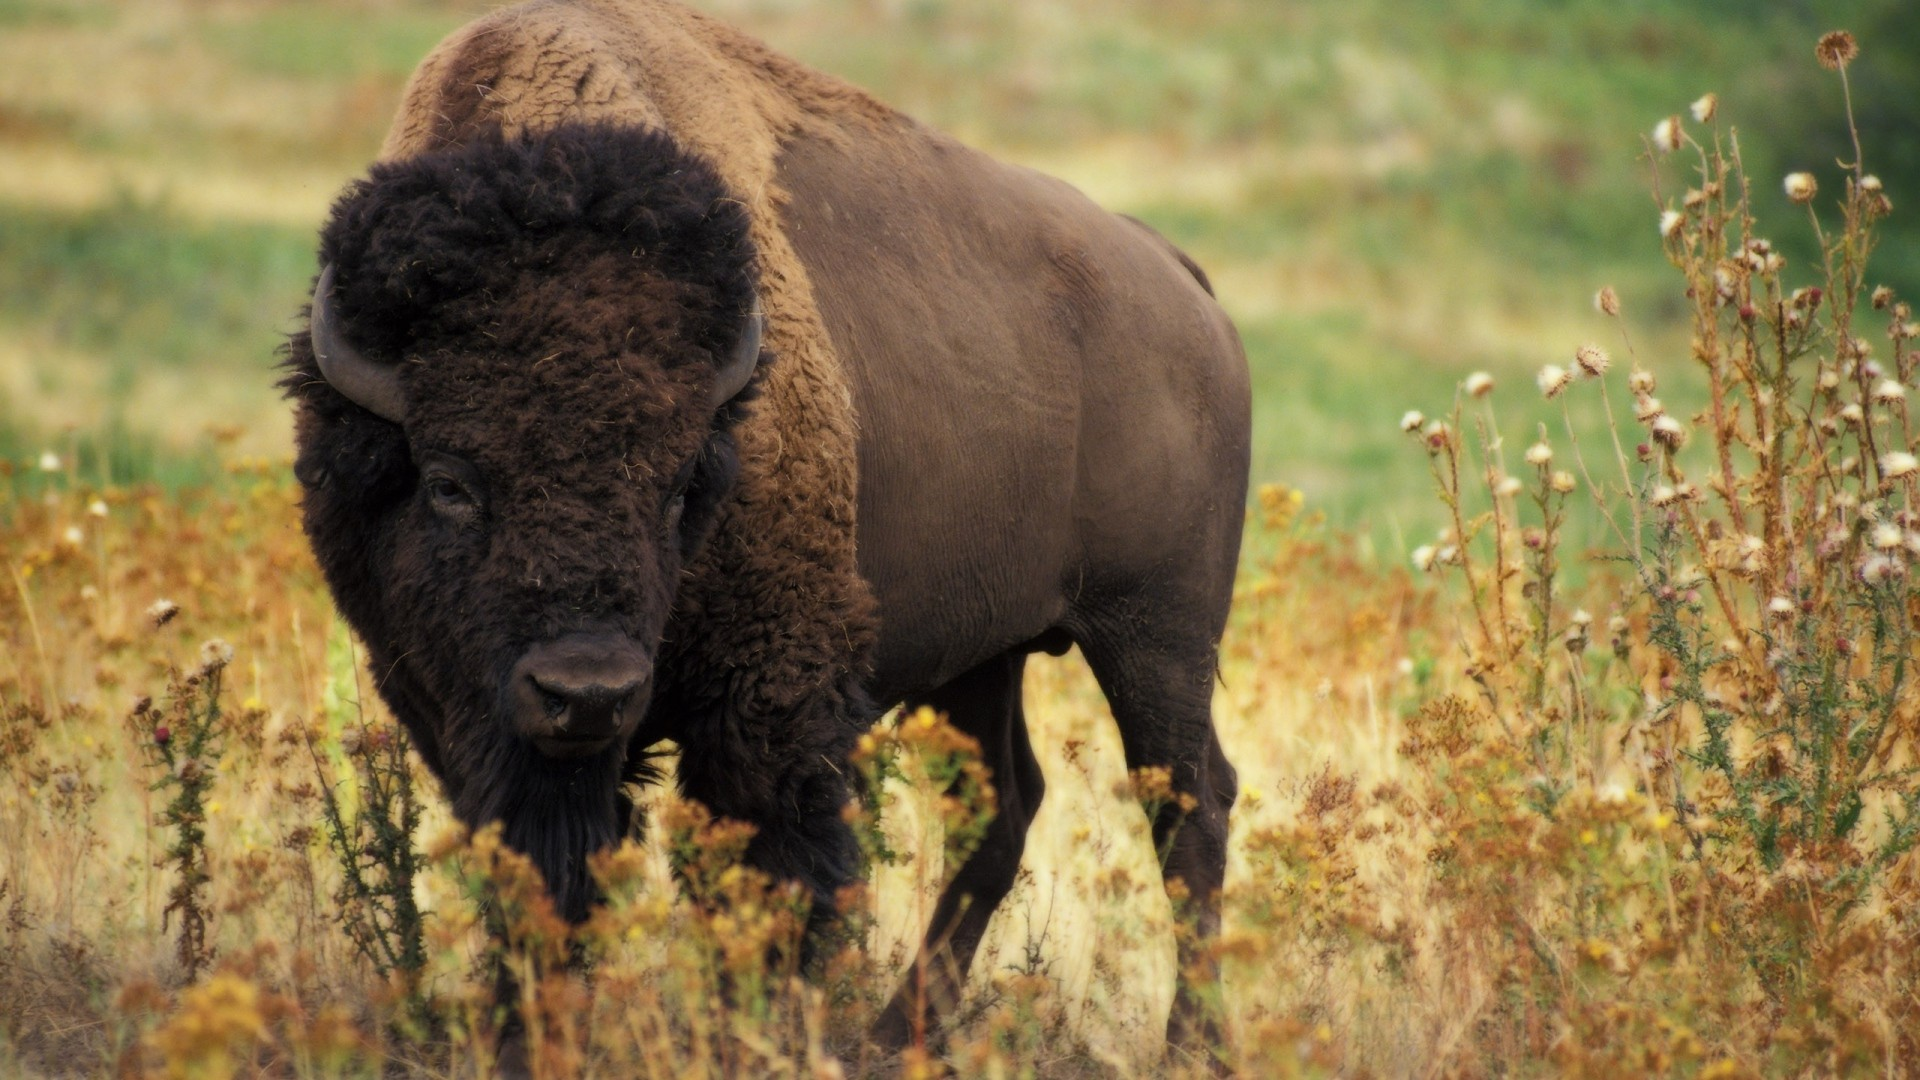 Amazing Bison Wallpaper - bison-wallpaper-hd-30865-31594-hd-wallpapers  Gallery_442416.jpg